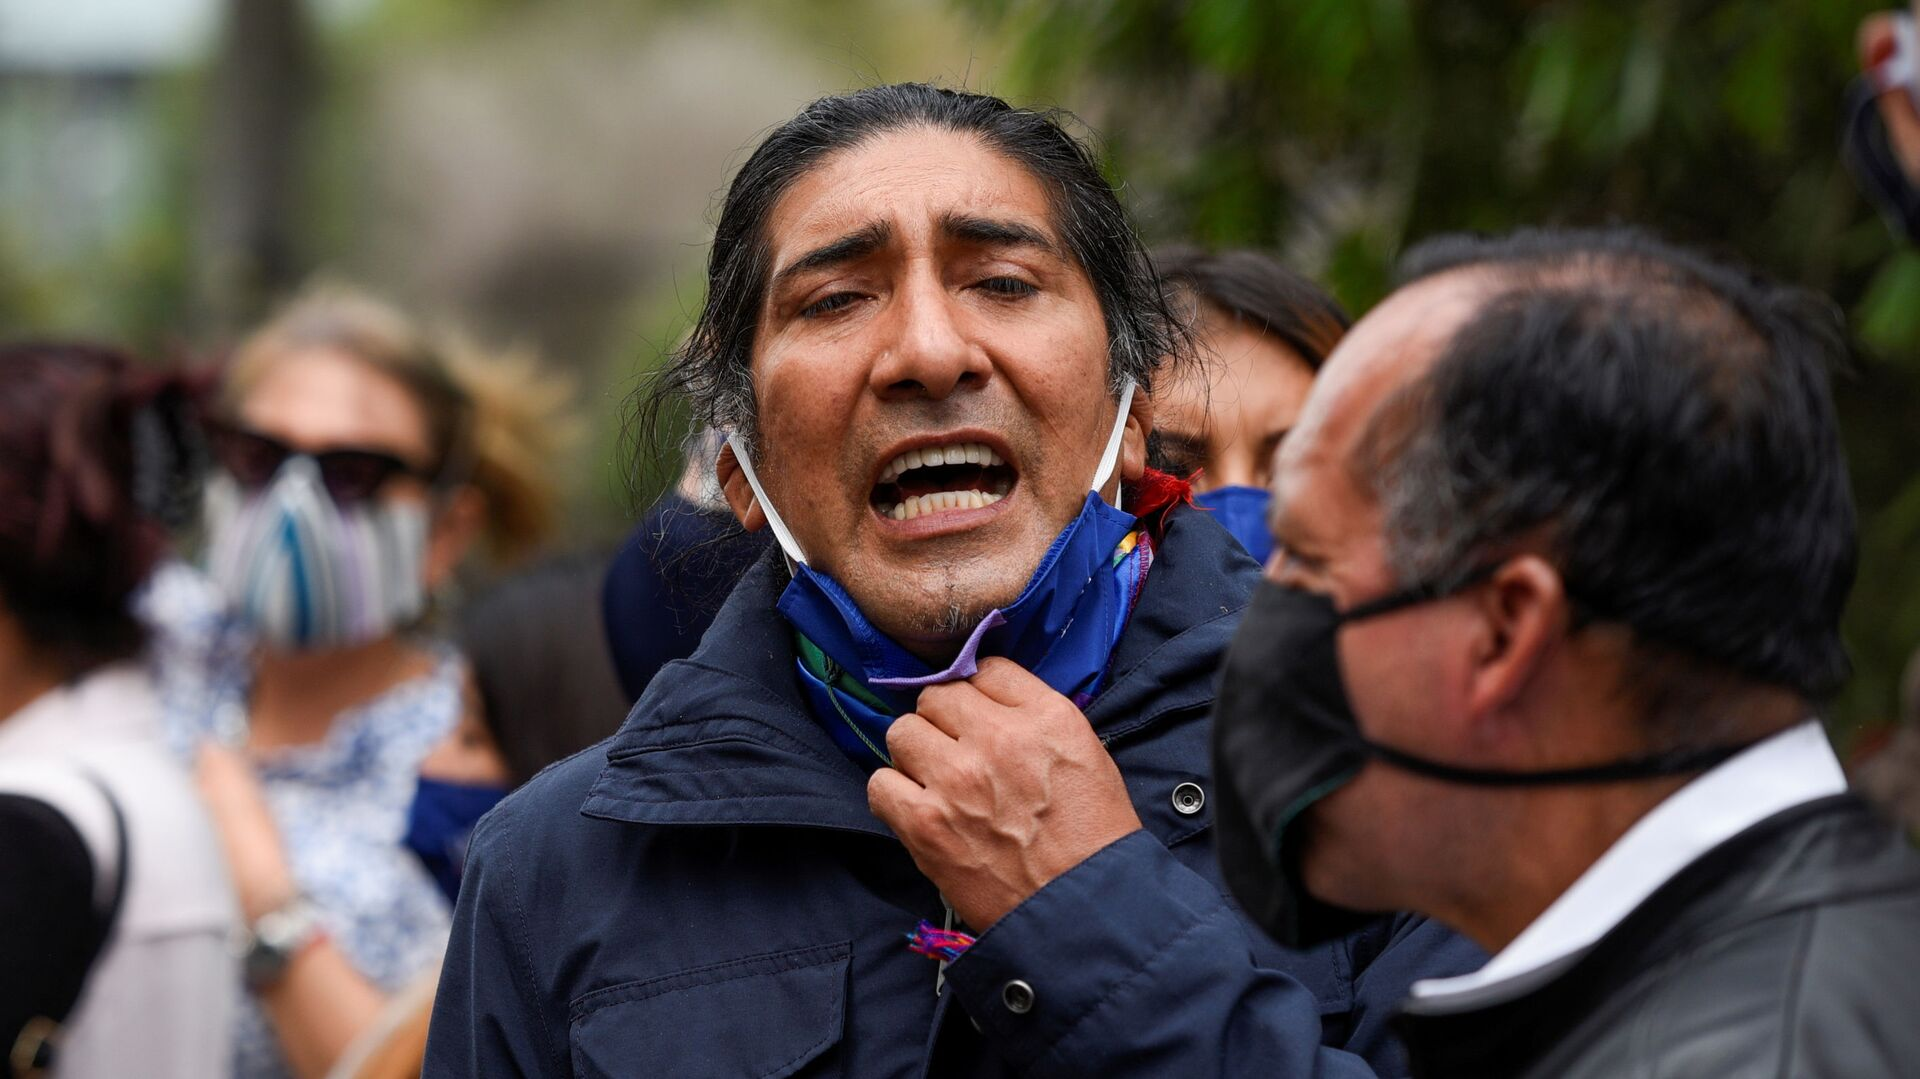 Yaku Pérez, el candidato indígena ecuatoriano - Sputnik Mundo, 1920, 18.02.2021